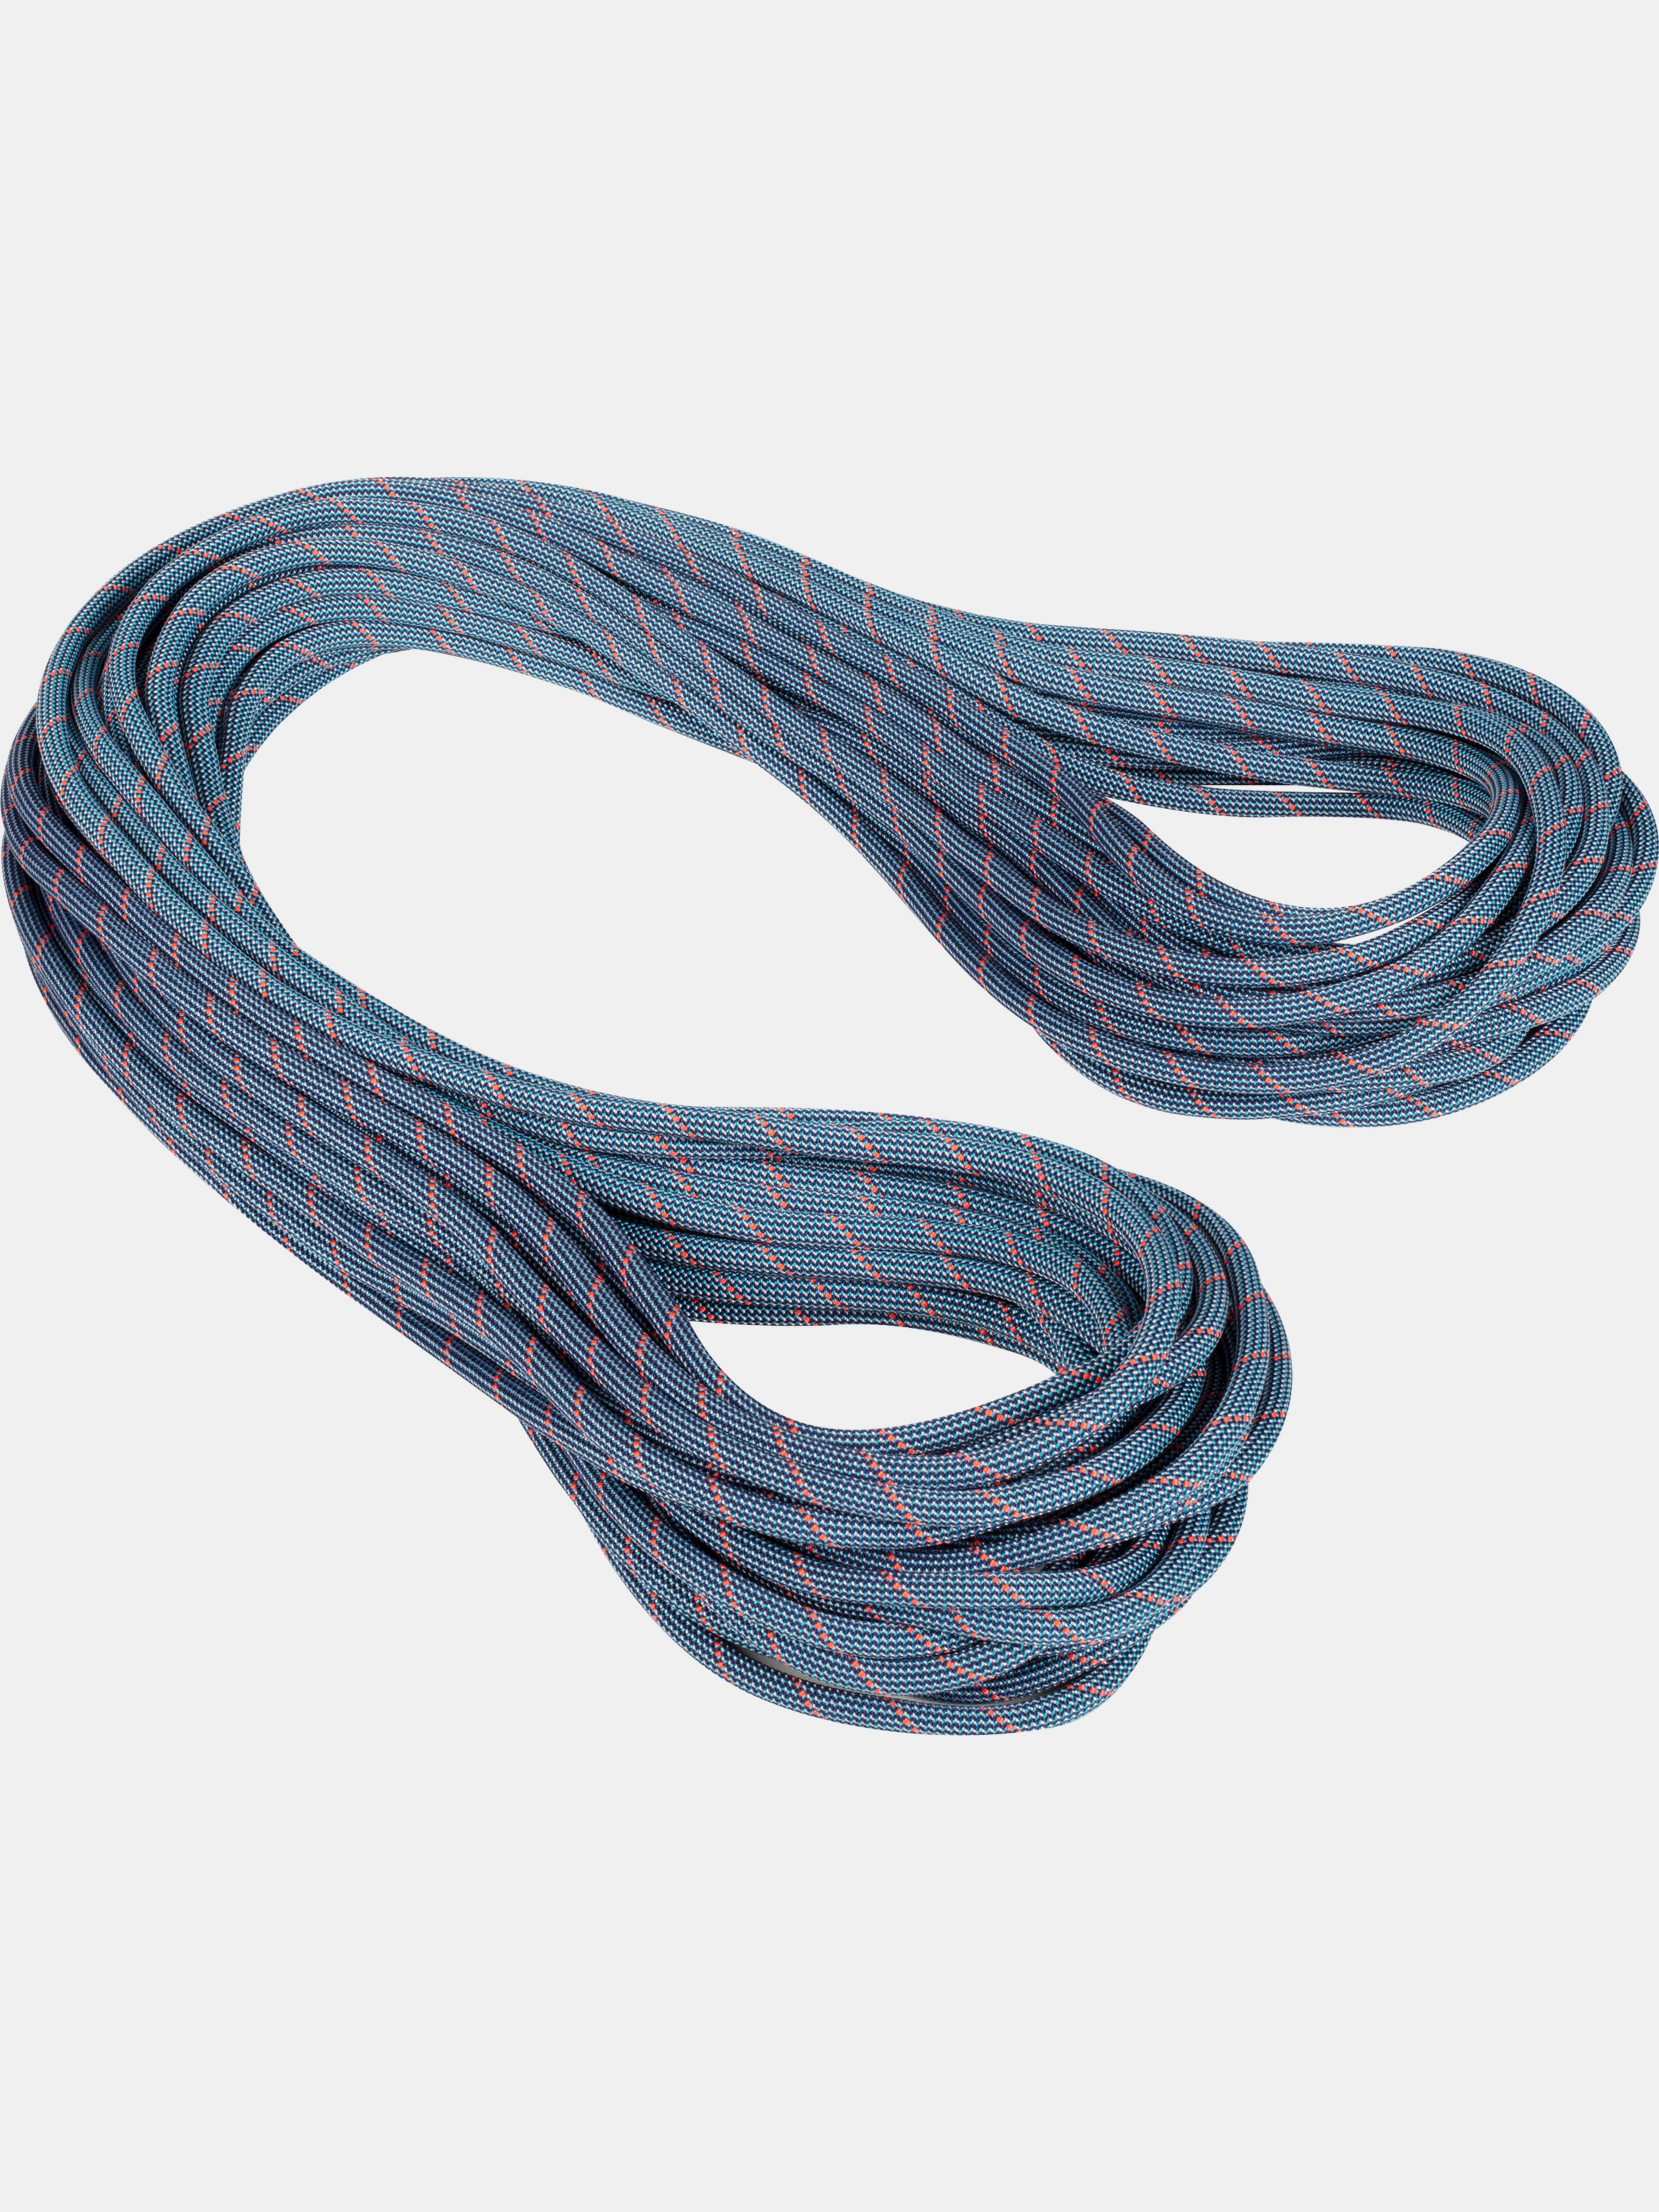 10.2 Crag Classic Rope thumbnail